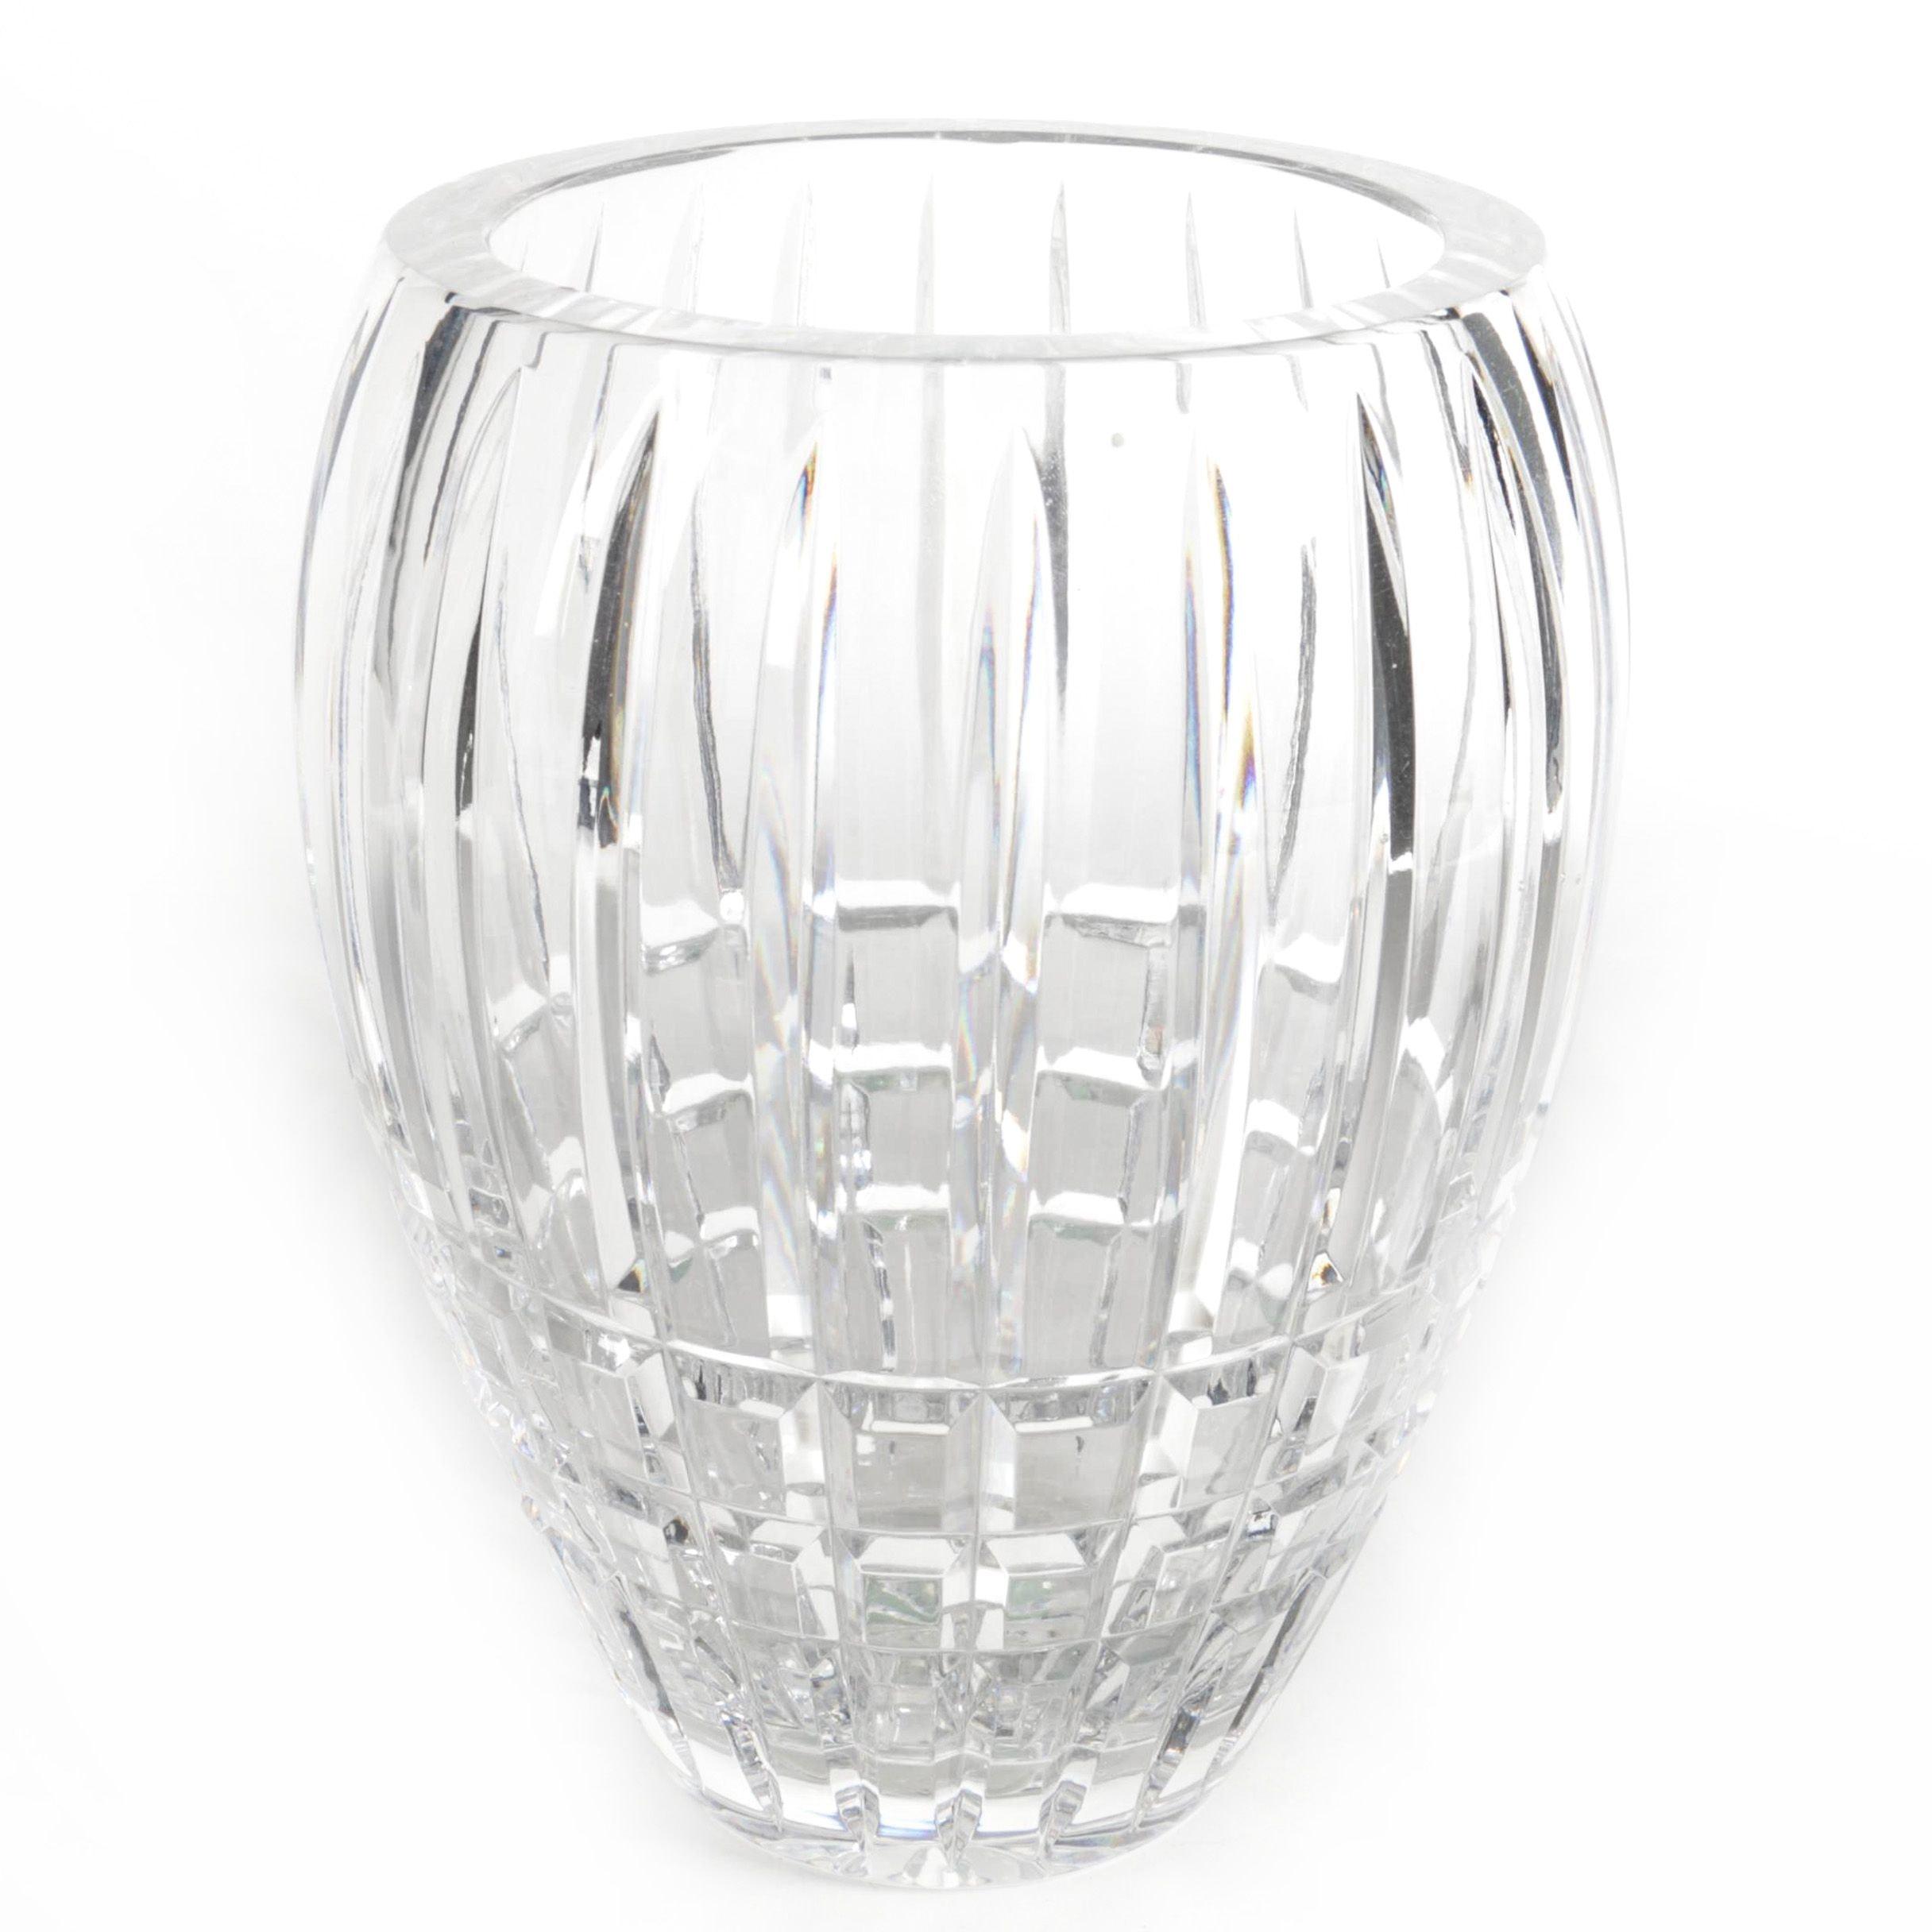 Ceska Crystal Vase